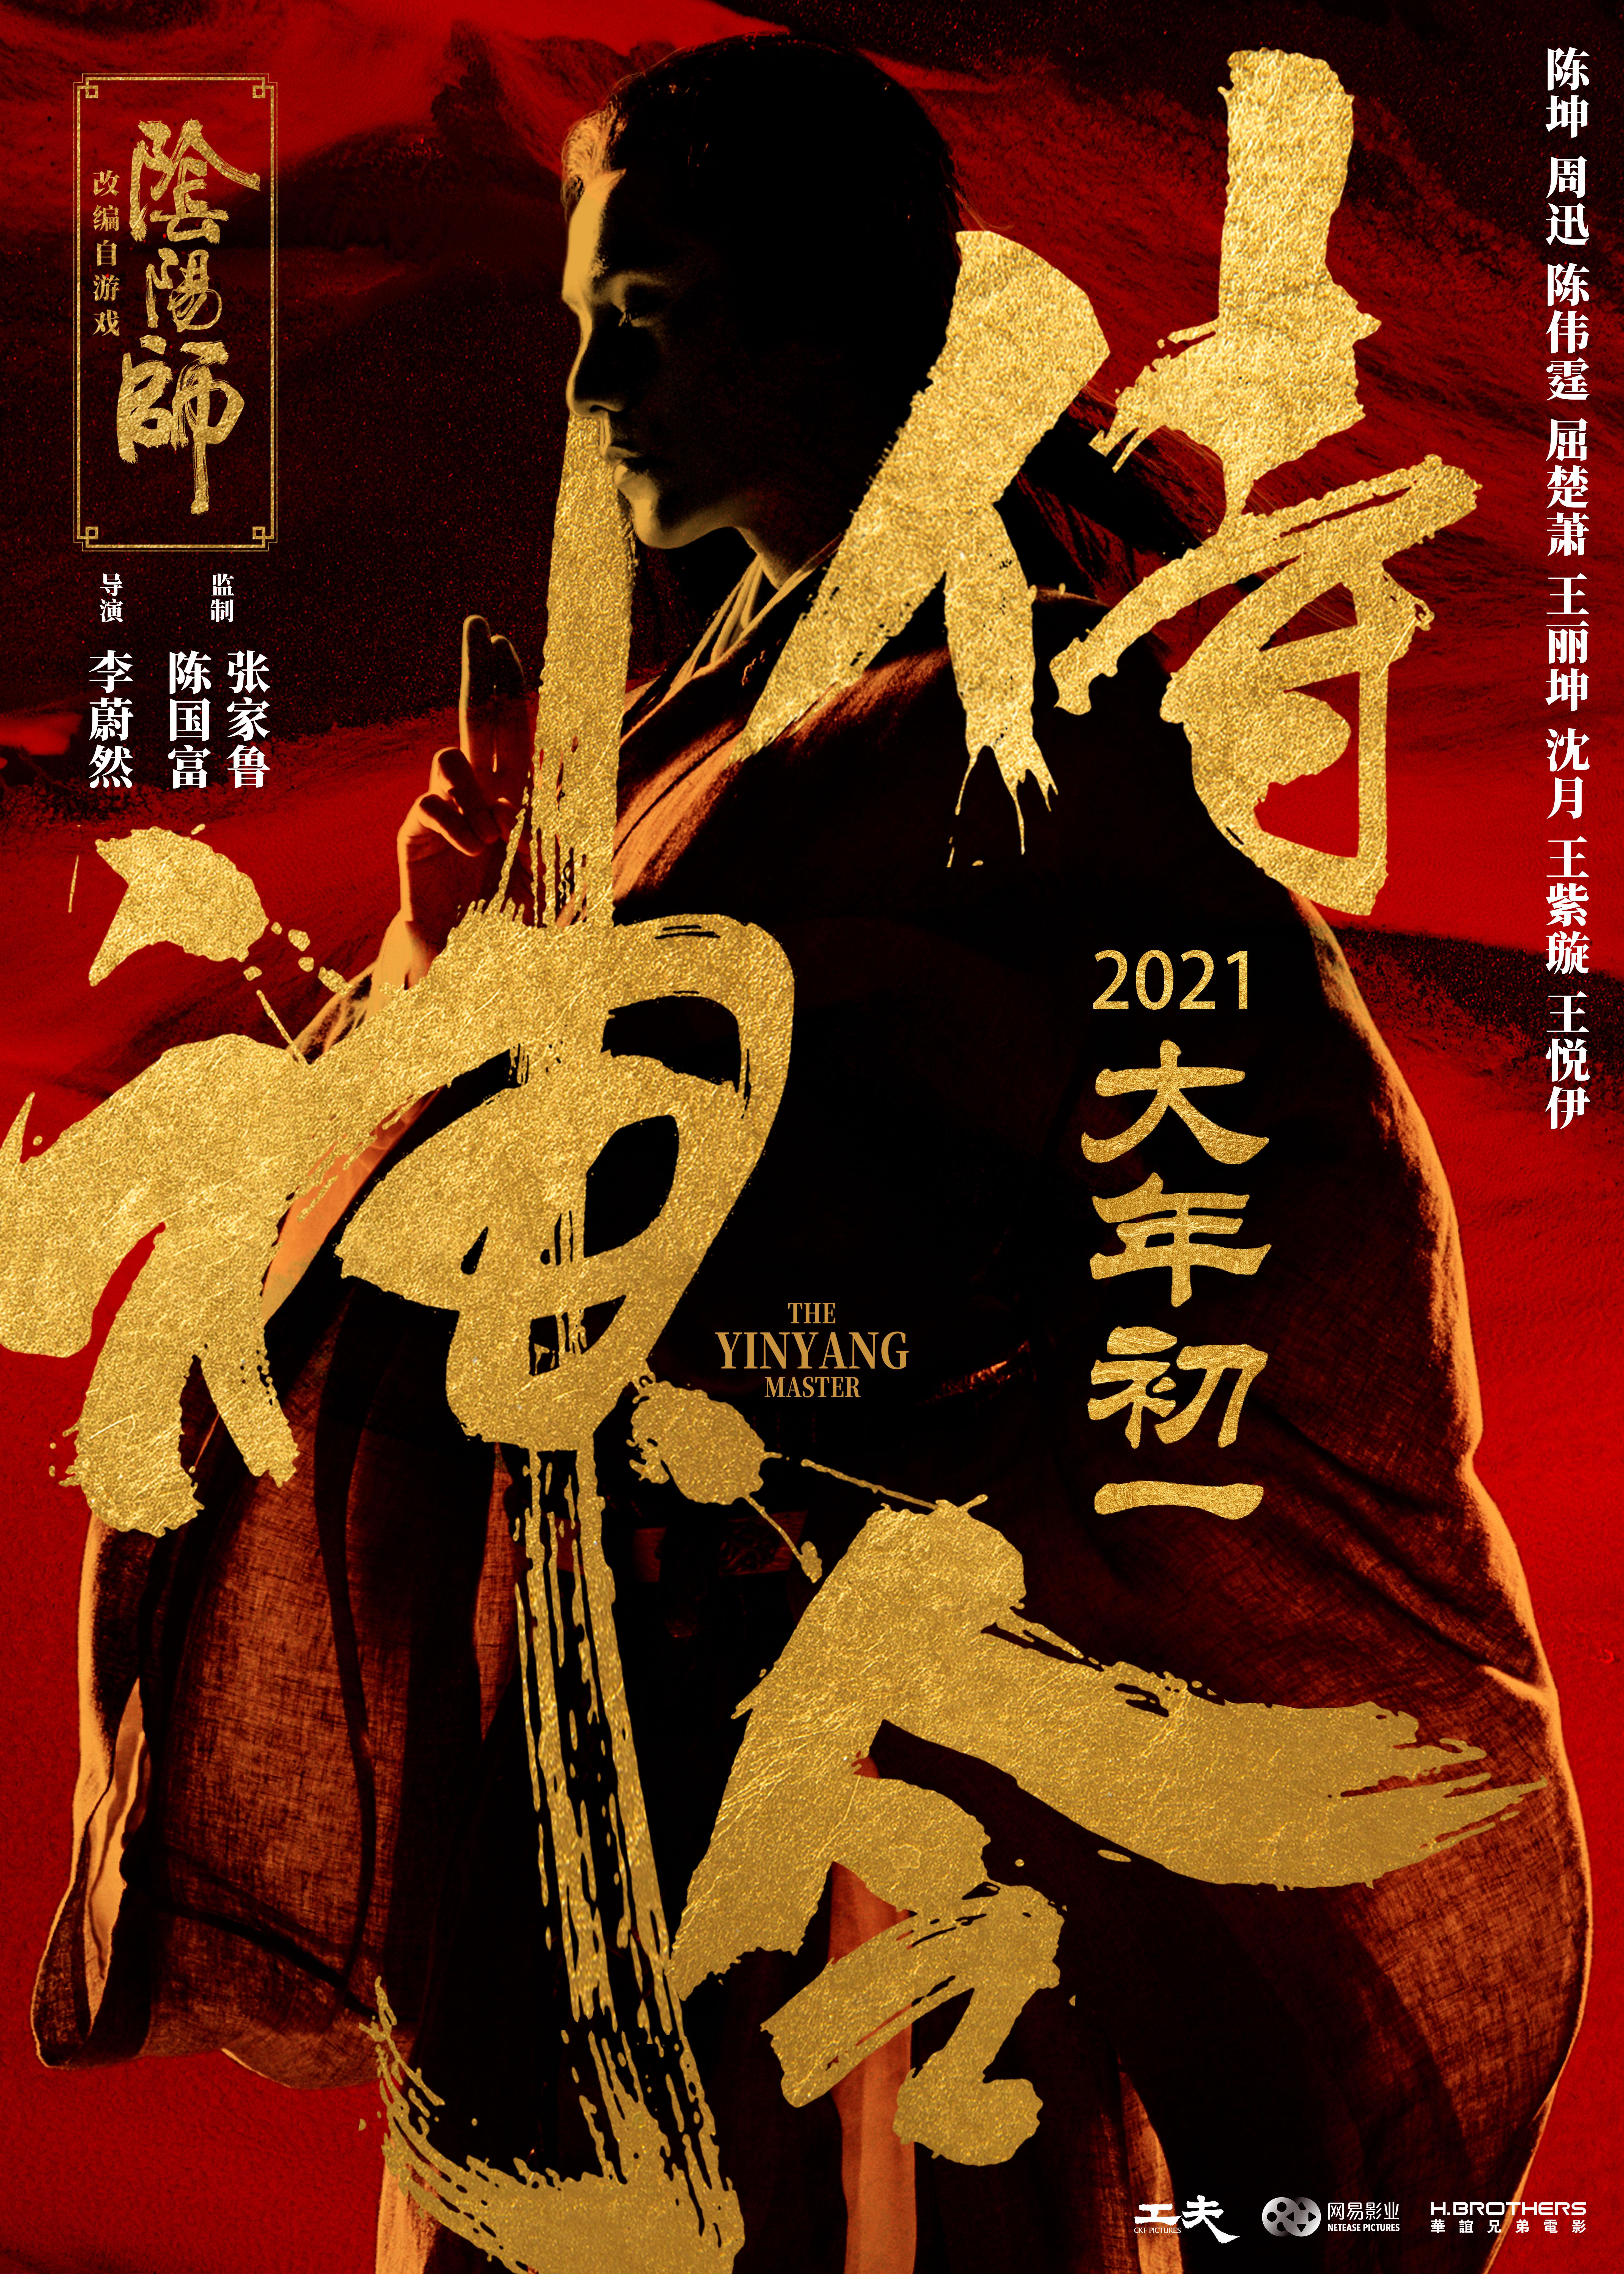 The Yinyang Master 2021 Imdb